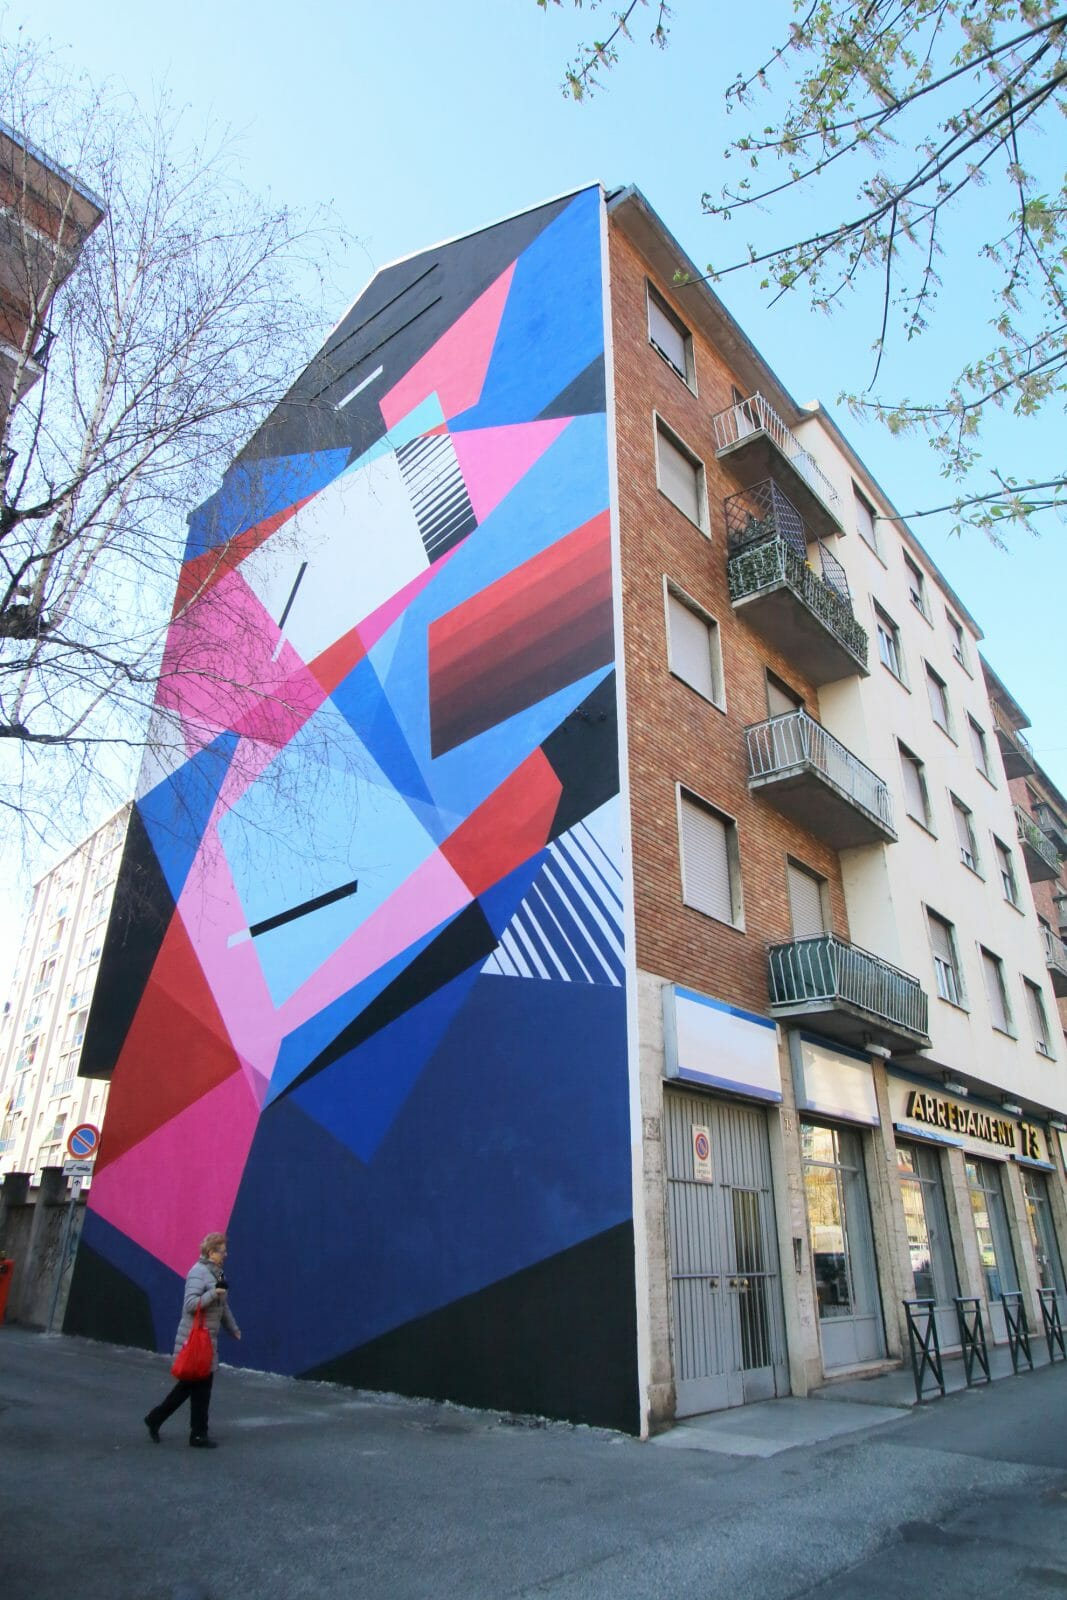 Collegno Si-Cura par le street artist Greg Jager